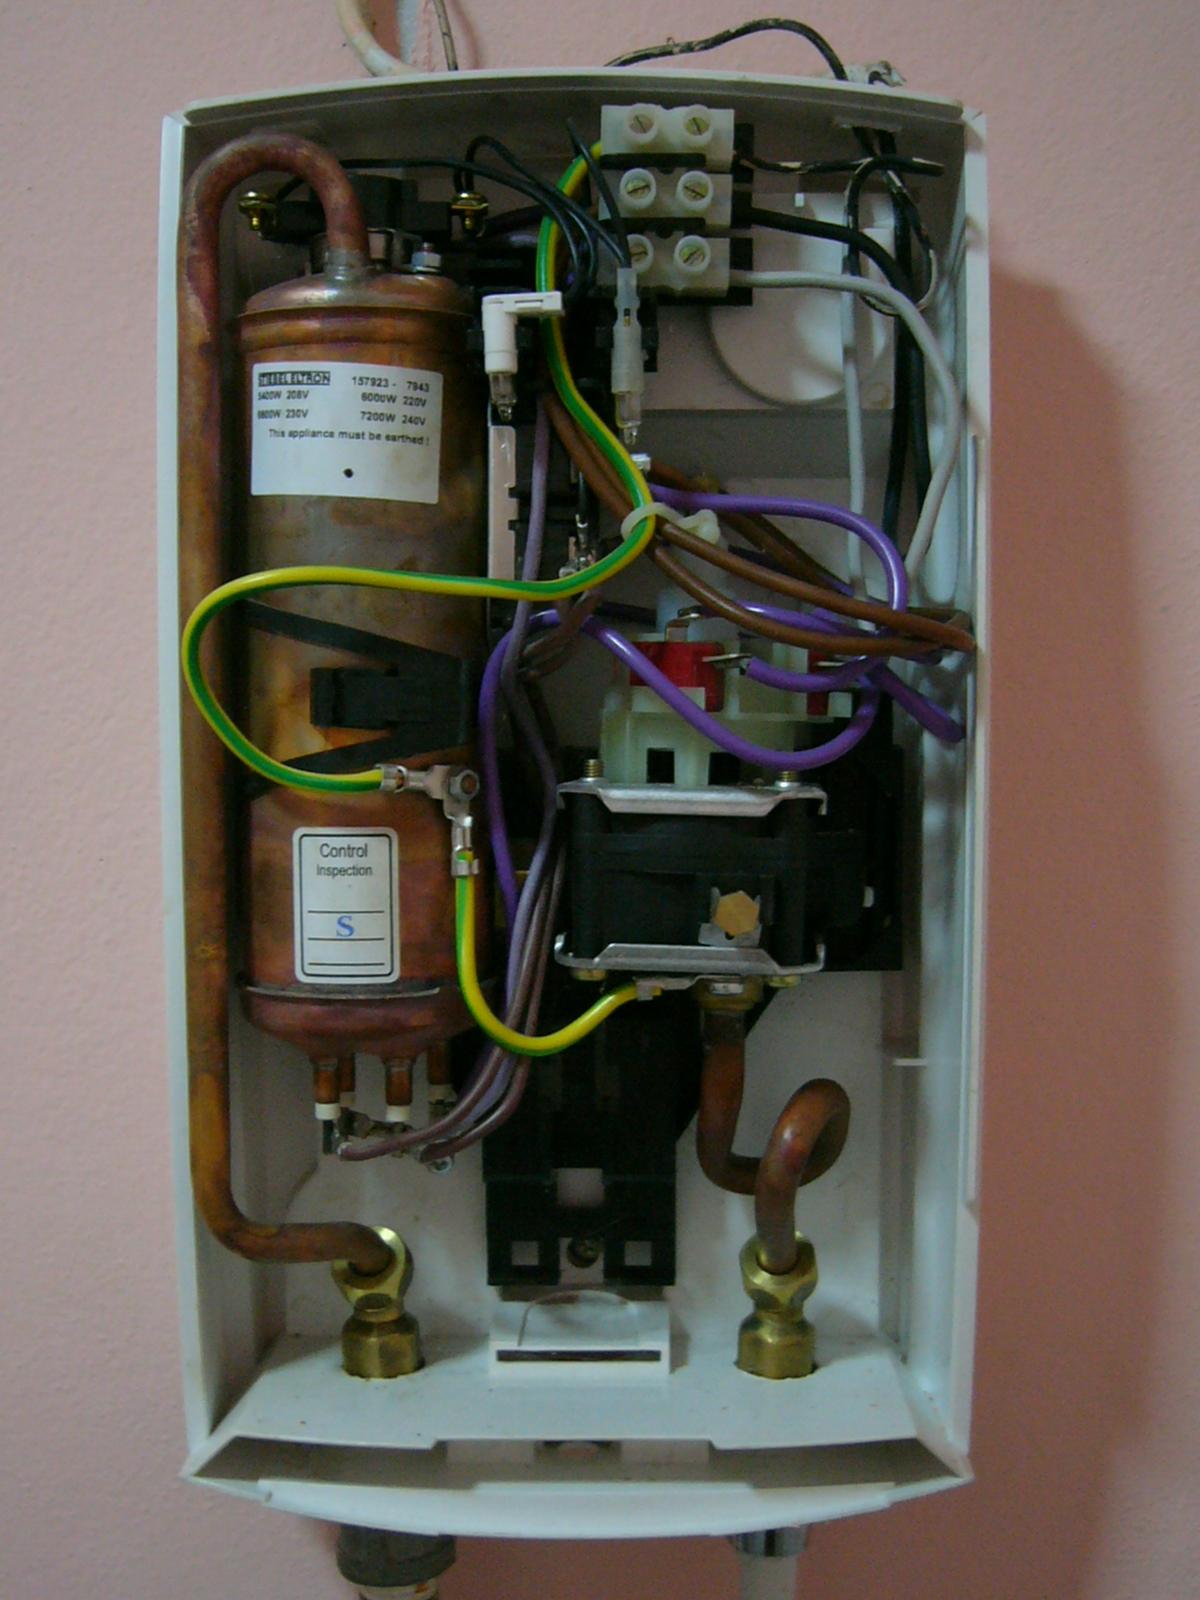 water geyser wiring diagram megasquirt 3 mega diagrams and information tankless heating - wikipedia